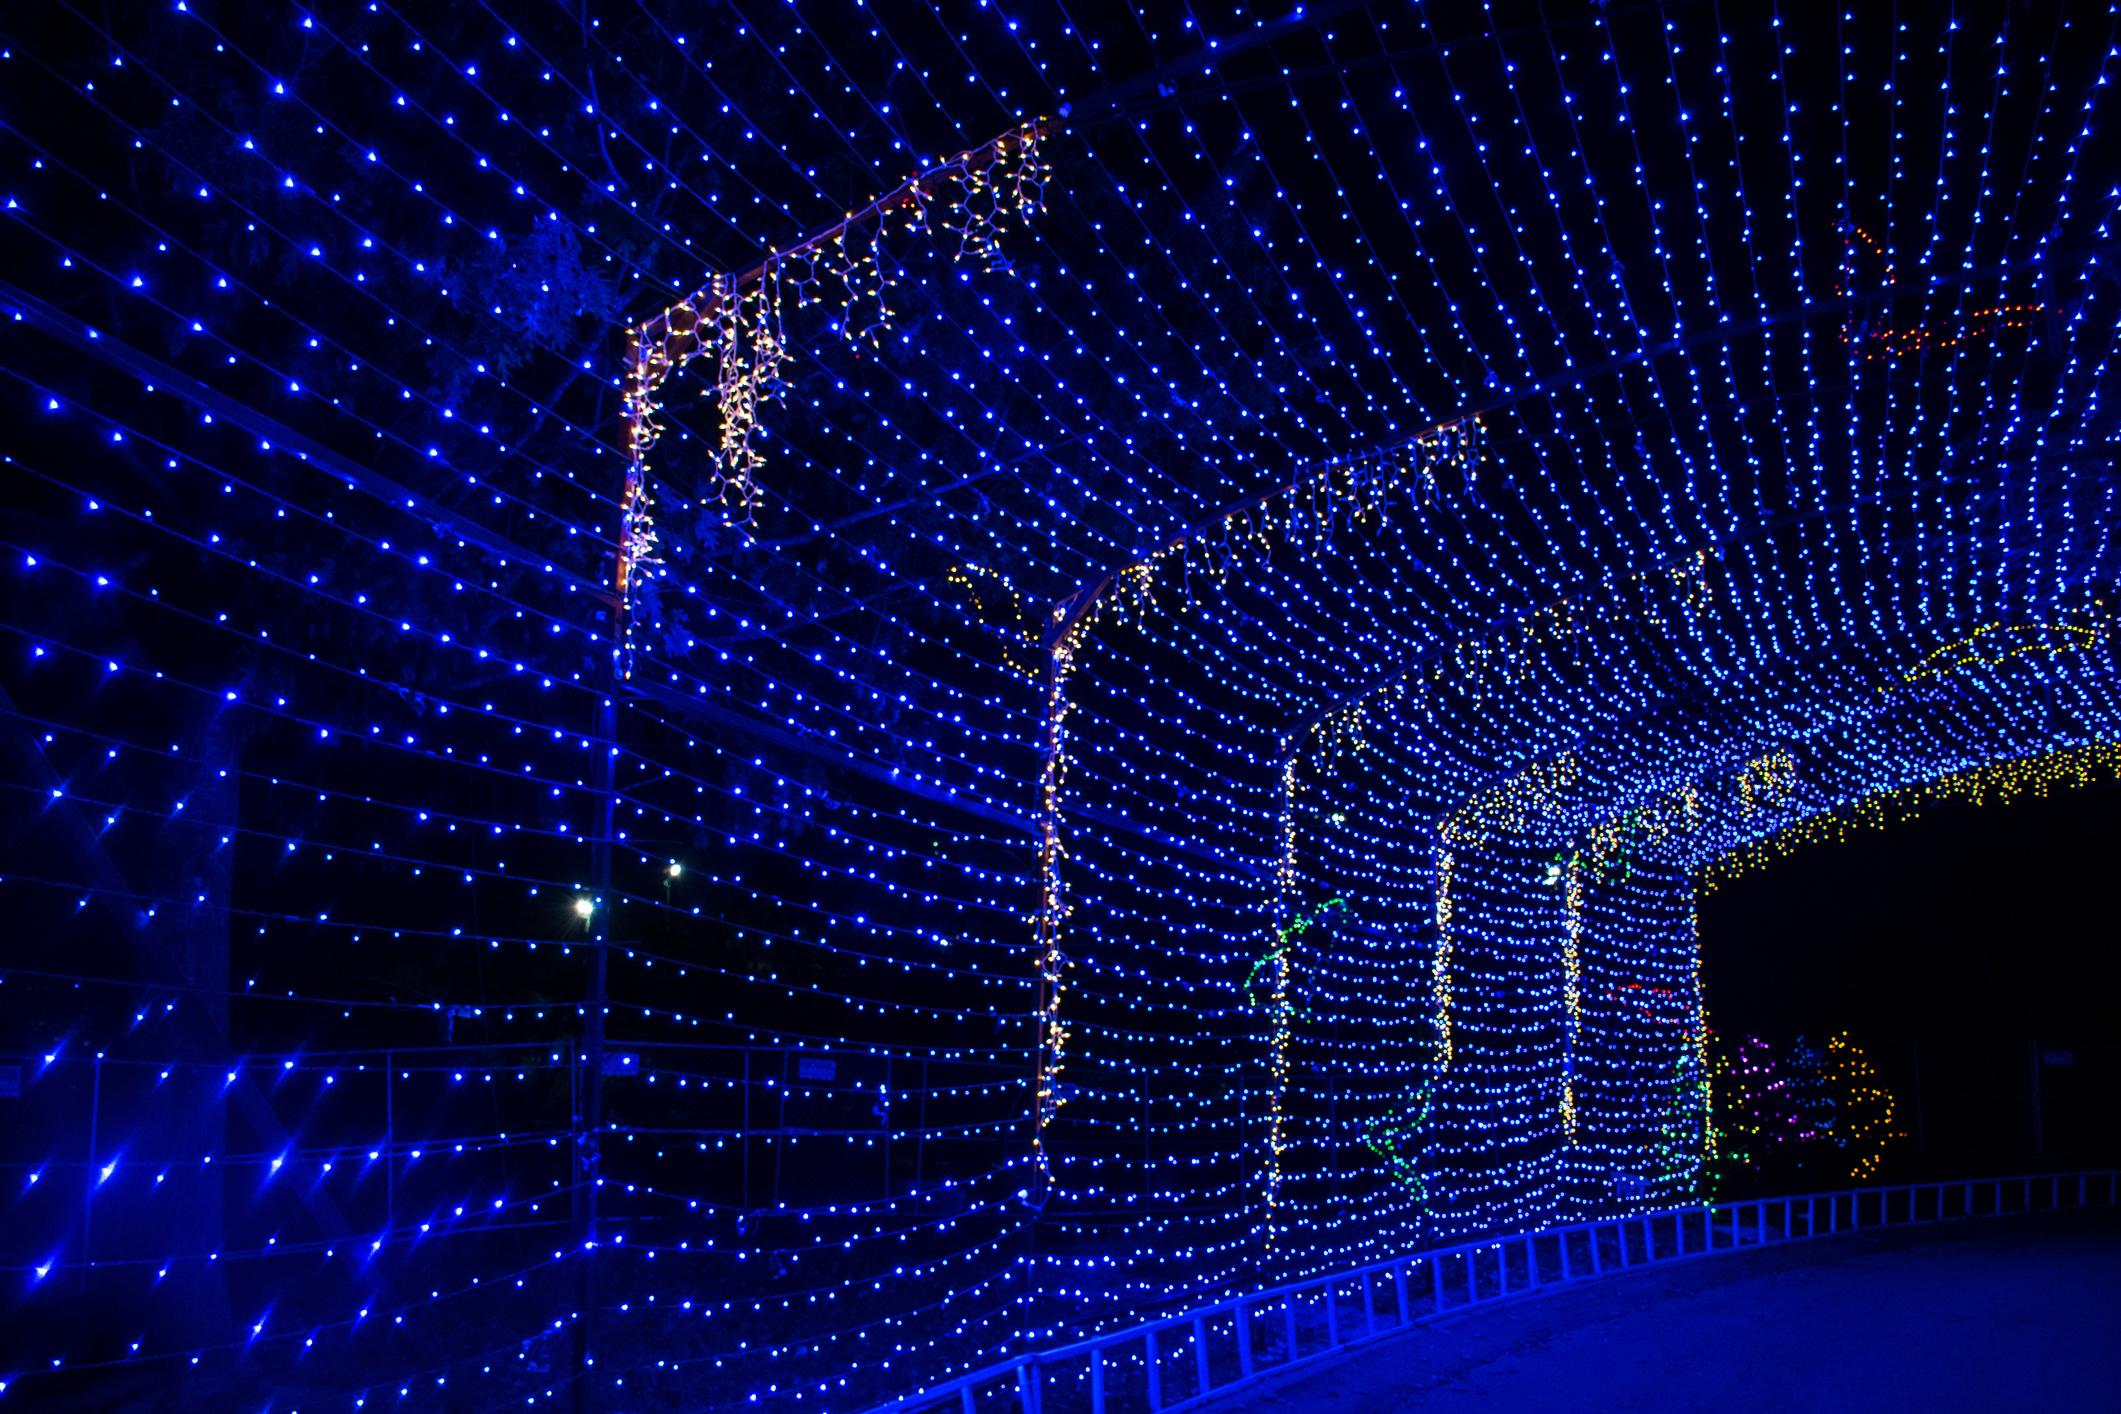 Tunnel of blue lights